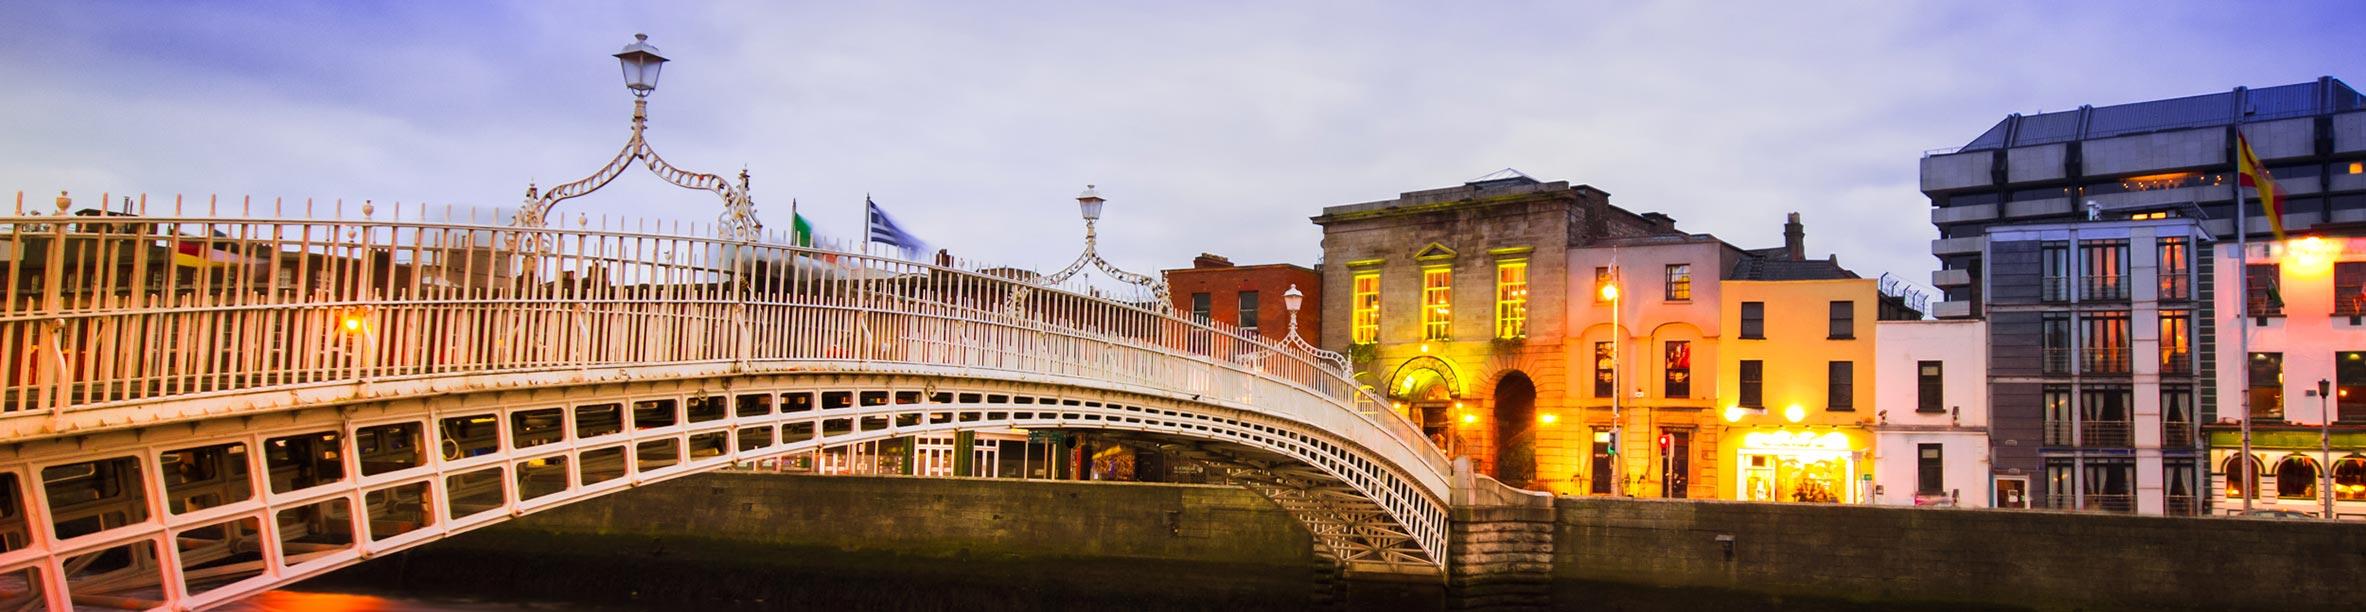 Ha' Penny Bridge, Dublino - Irlanda